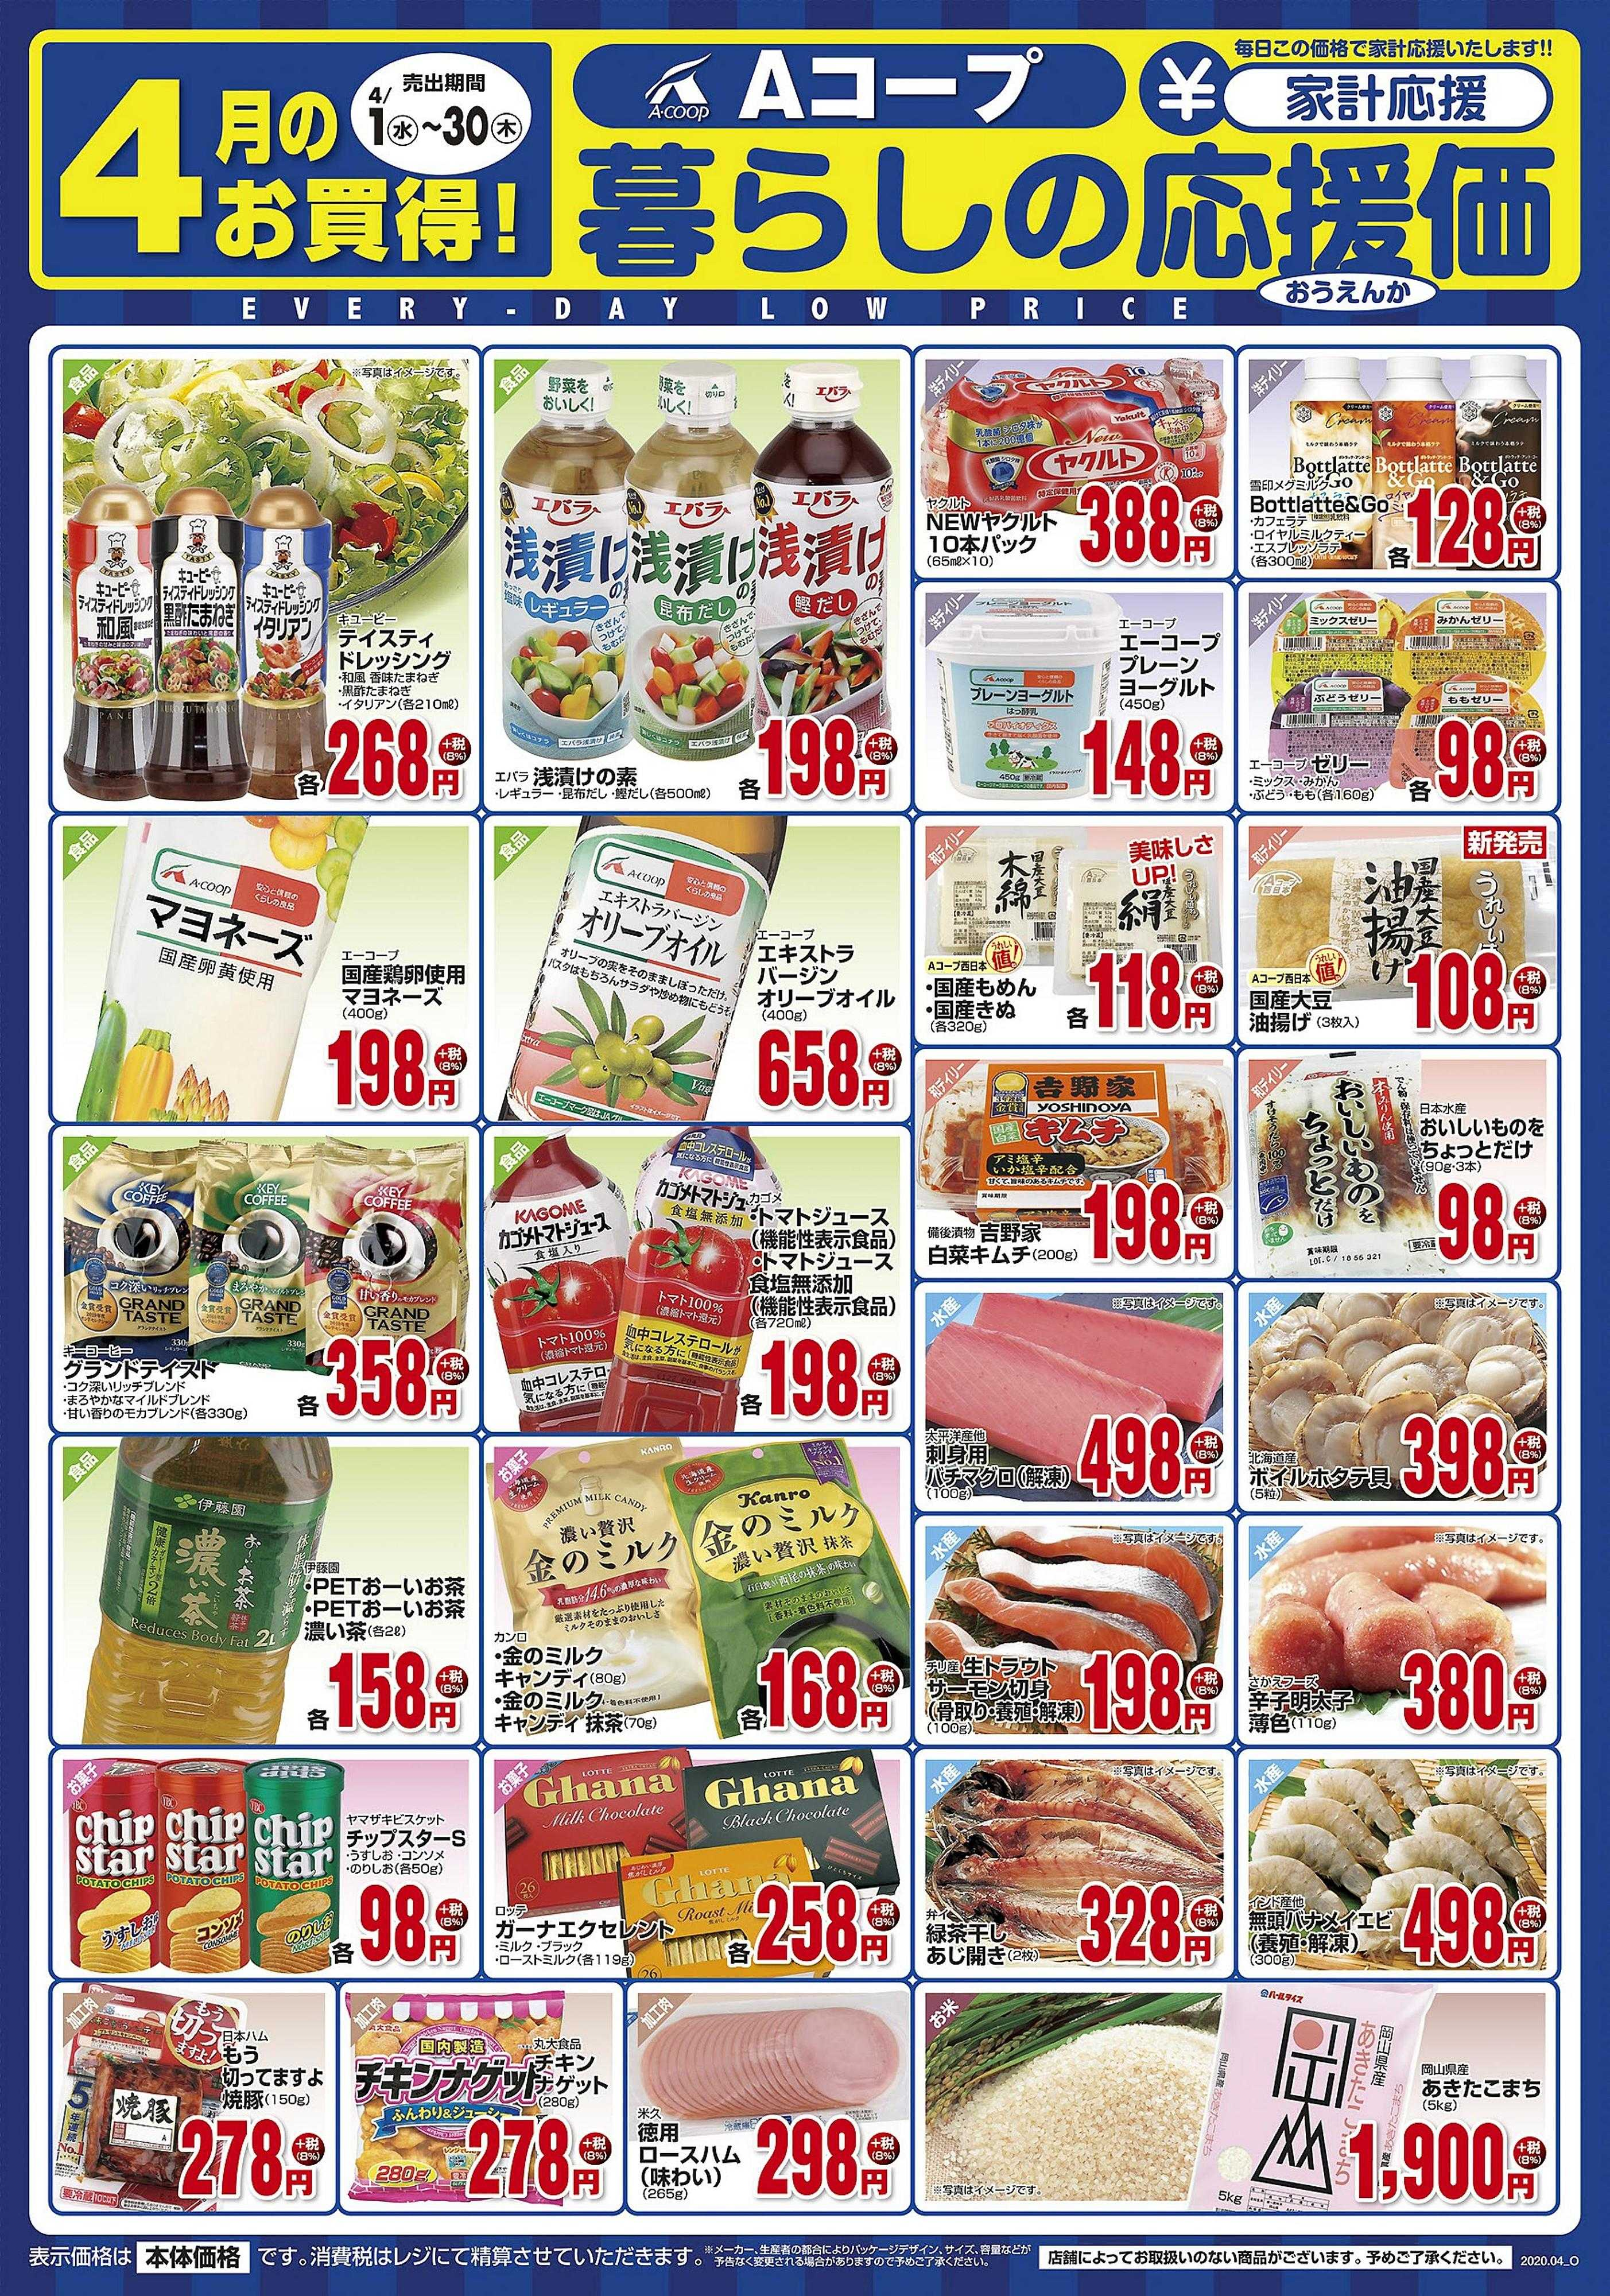 Aコープ西日本 岡山エリア【4月度】暮らしの応援価